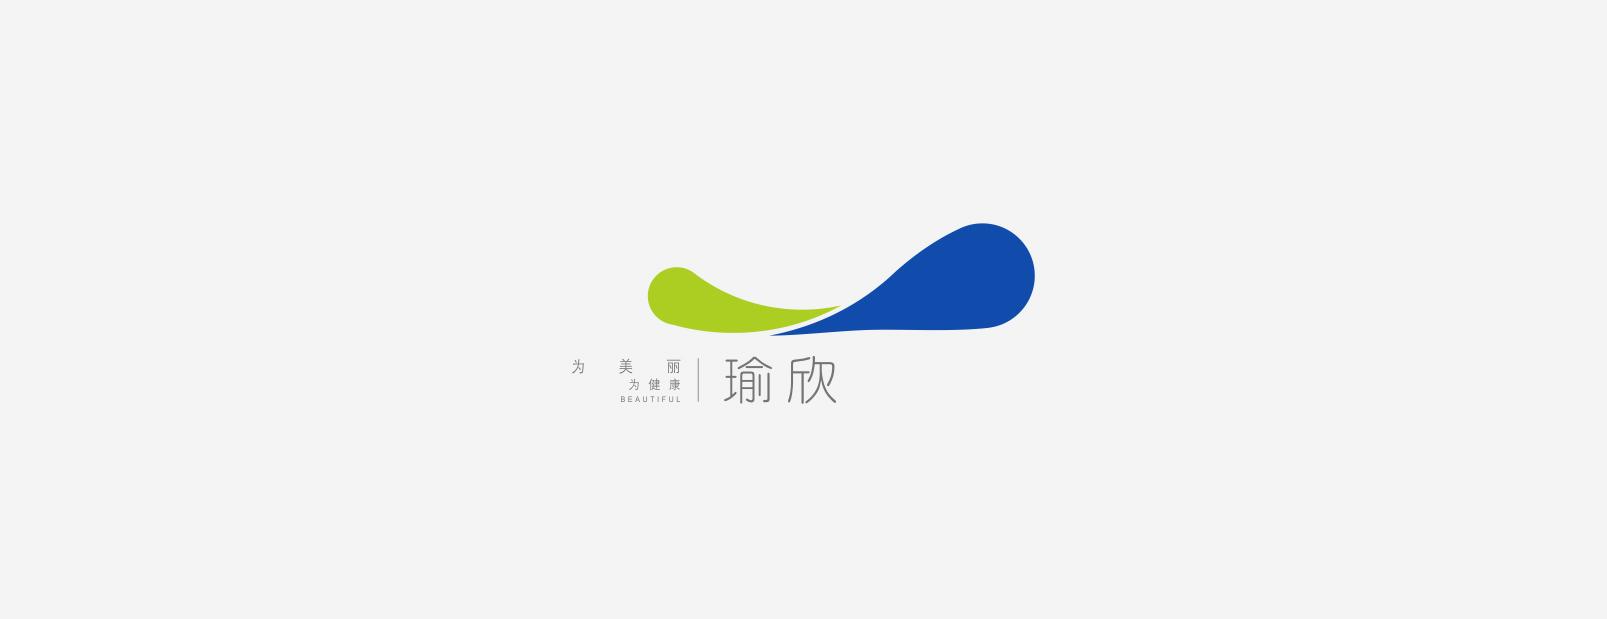 瑜欣logo设计